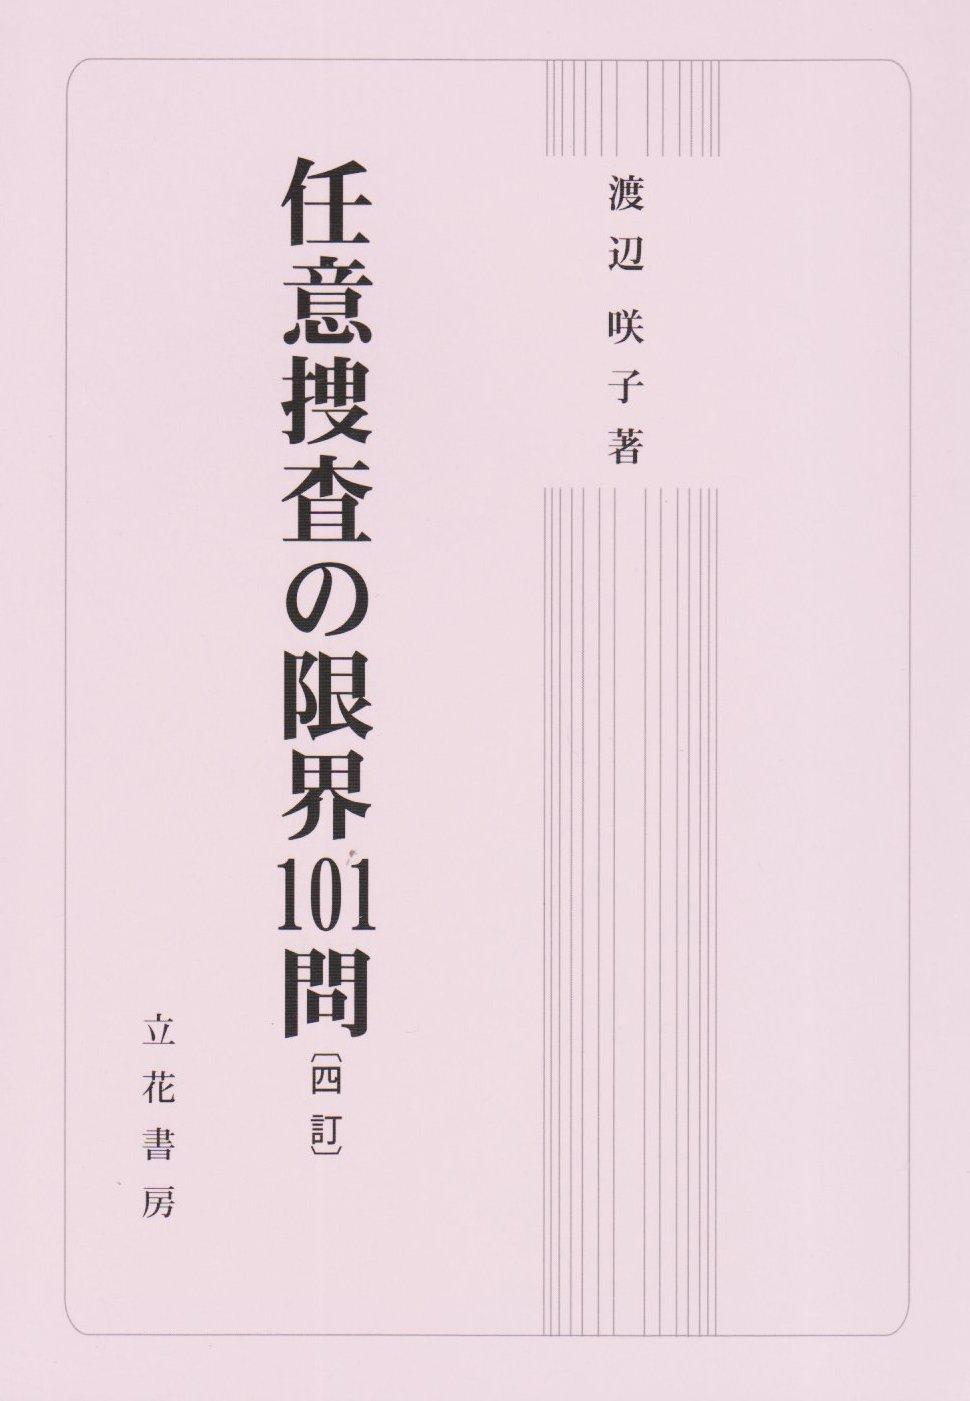 Amazon.co.jp: 任意捜査の限界101問 4訂: 渡辺 咲子: 本